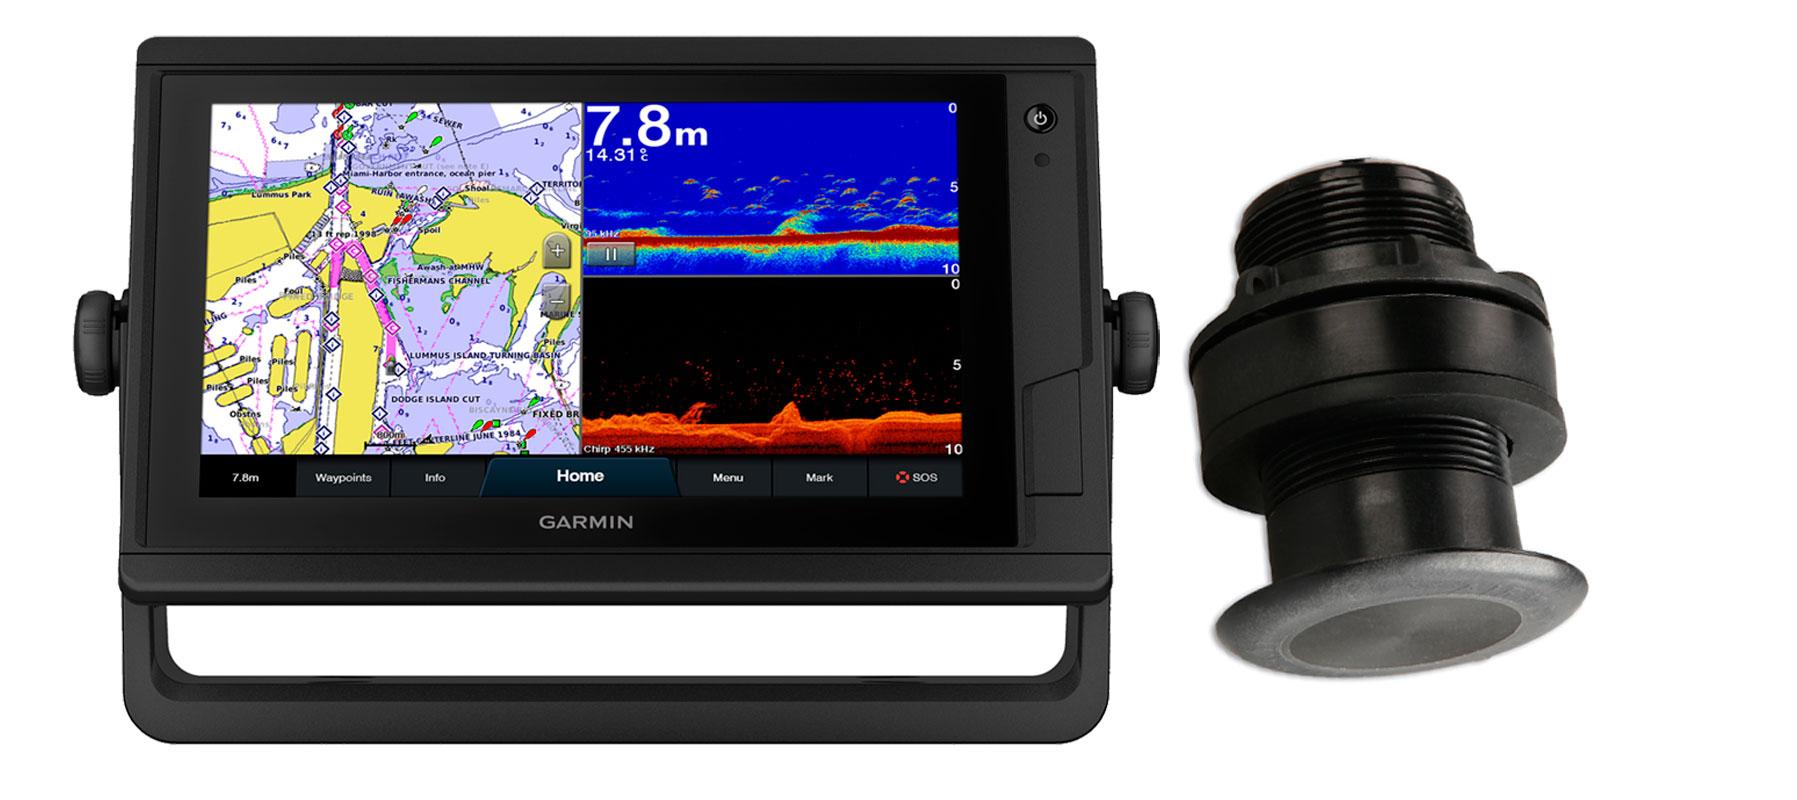 Garmin GPSmap 922xs PLUS og P319 transducer